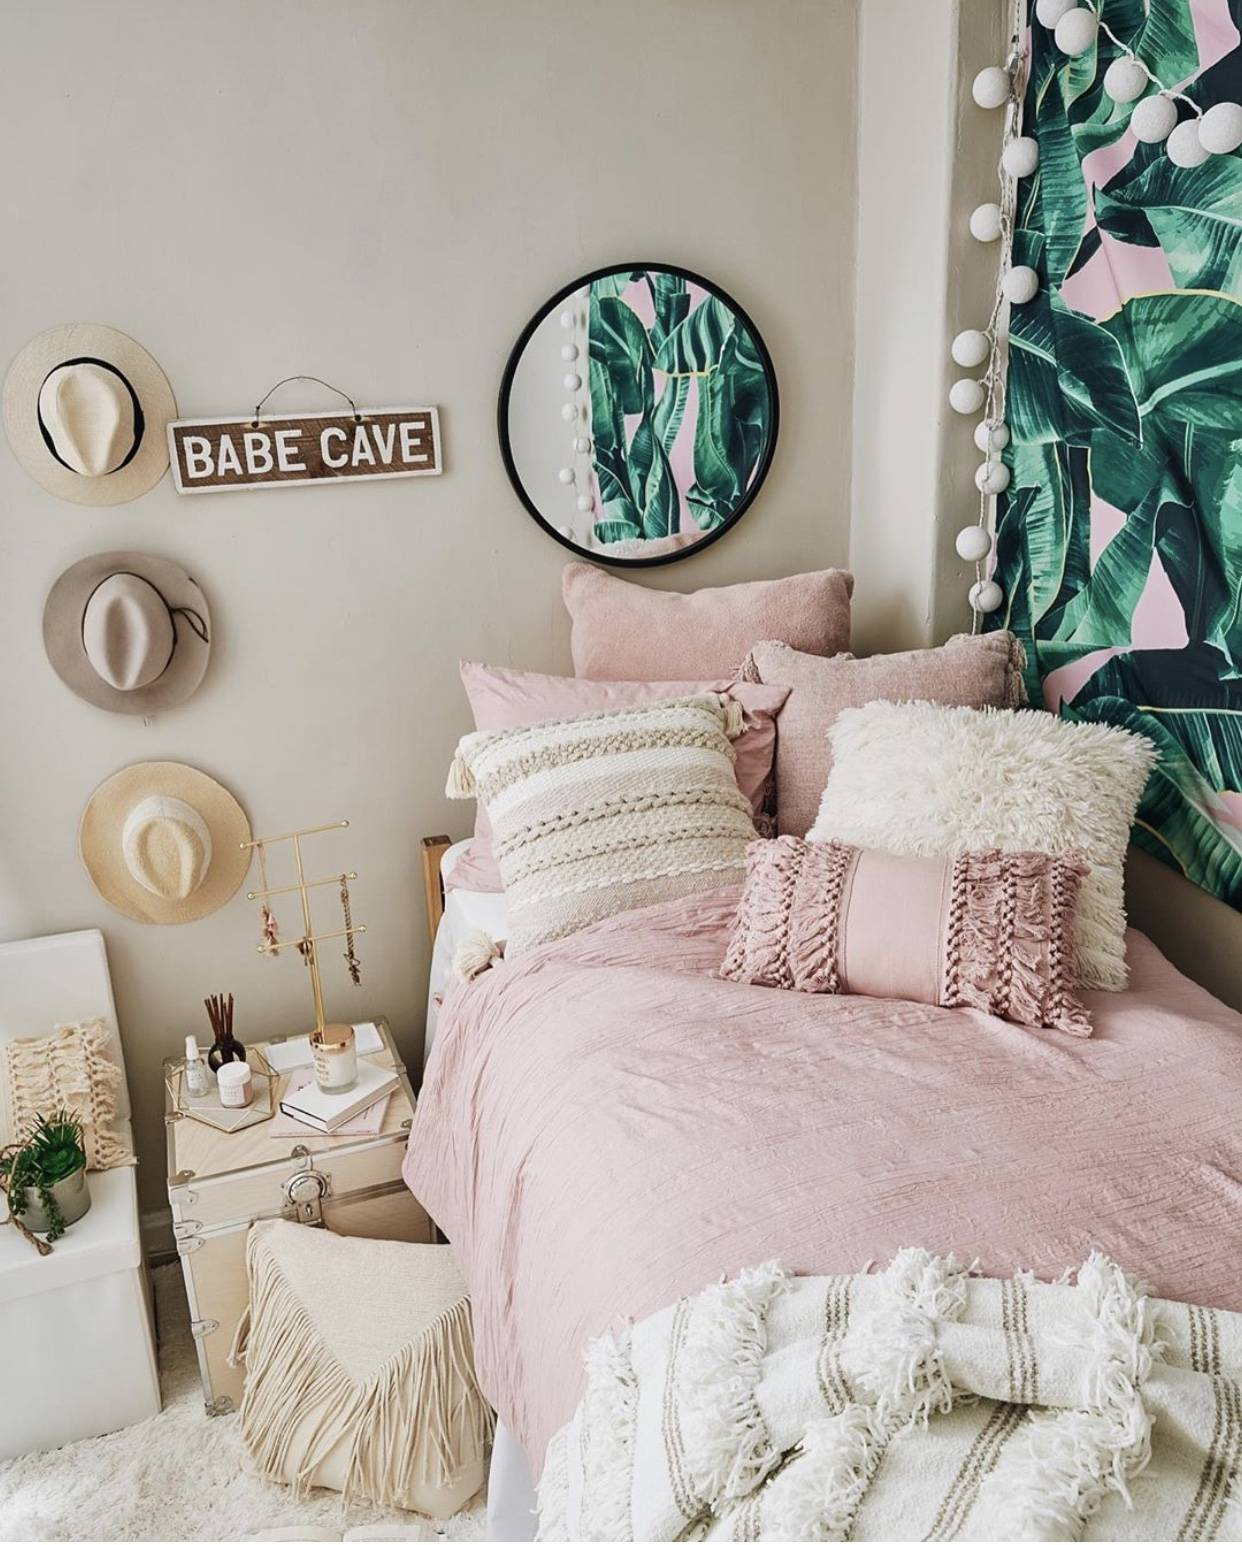 Vsco Decor Ideas Must Have Decor For A Vsco Room The Pink Dream